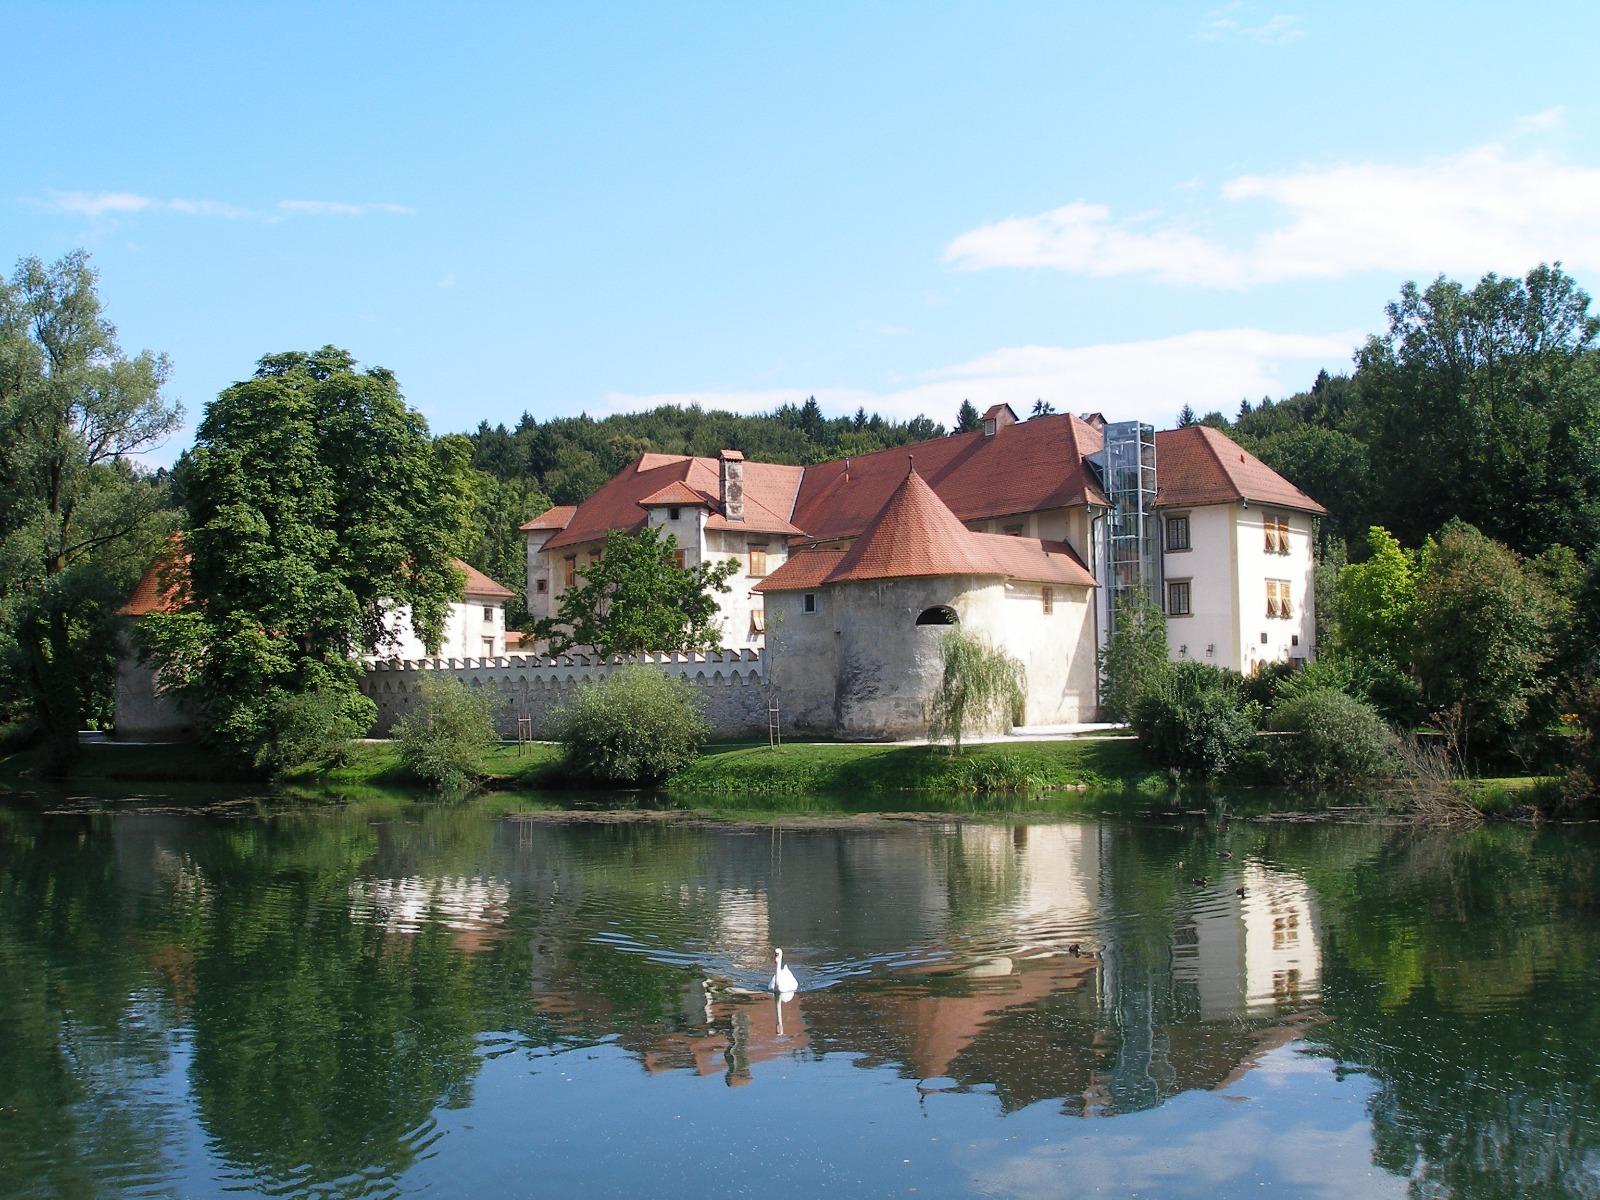 slovenia051-1601387455.jpg